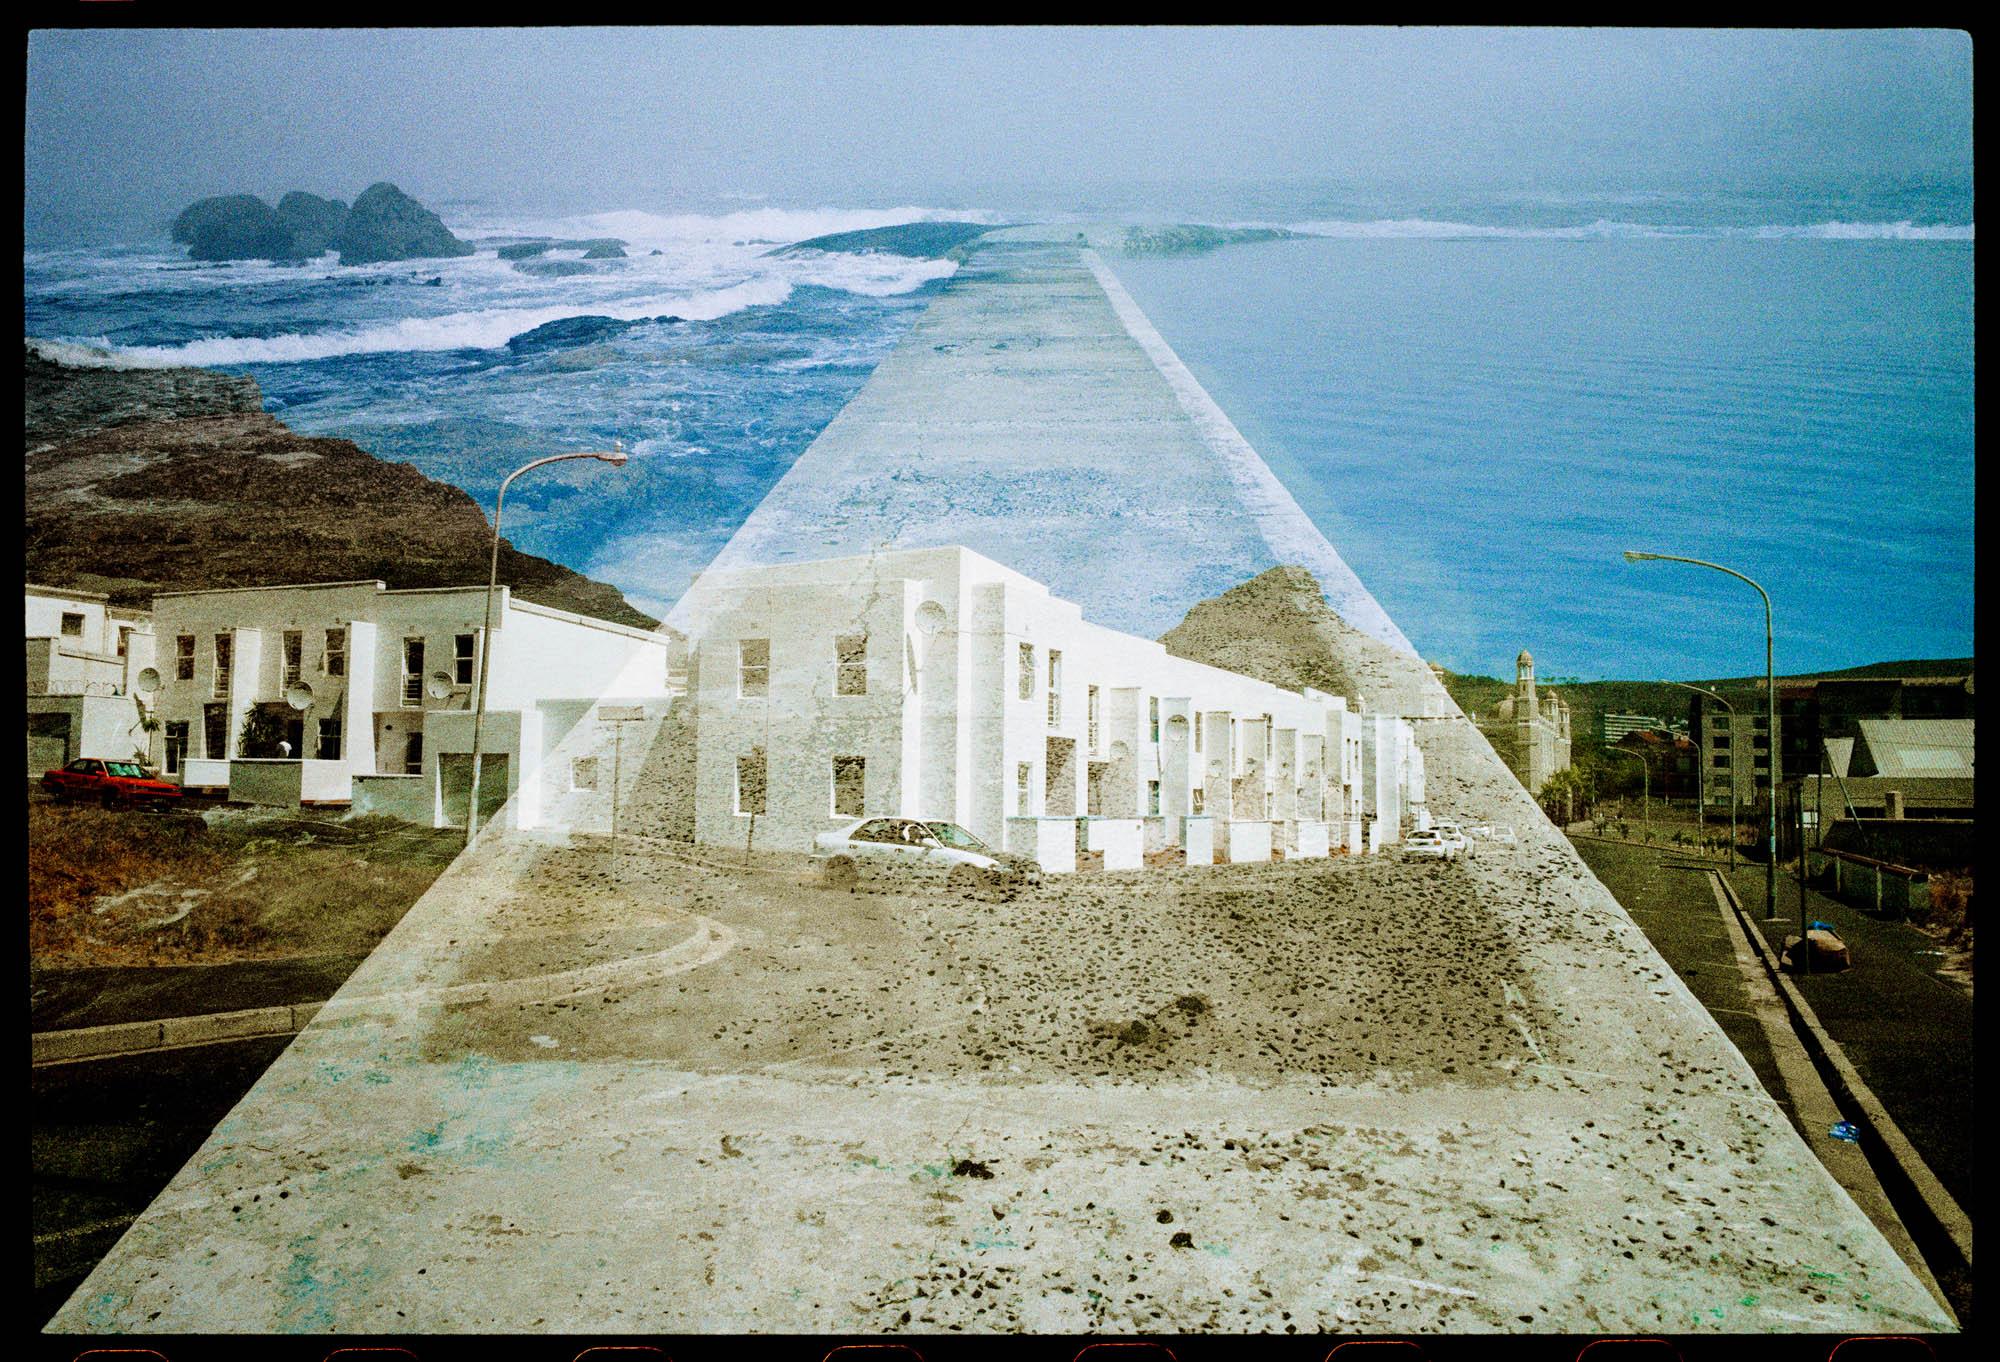 Pyramid_A4.jpg